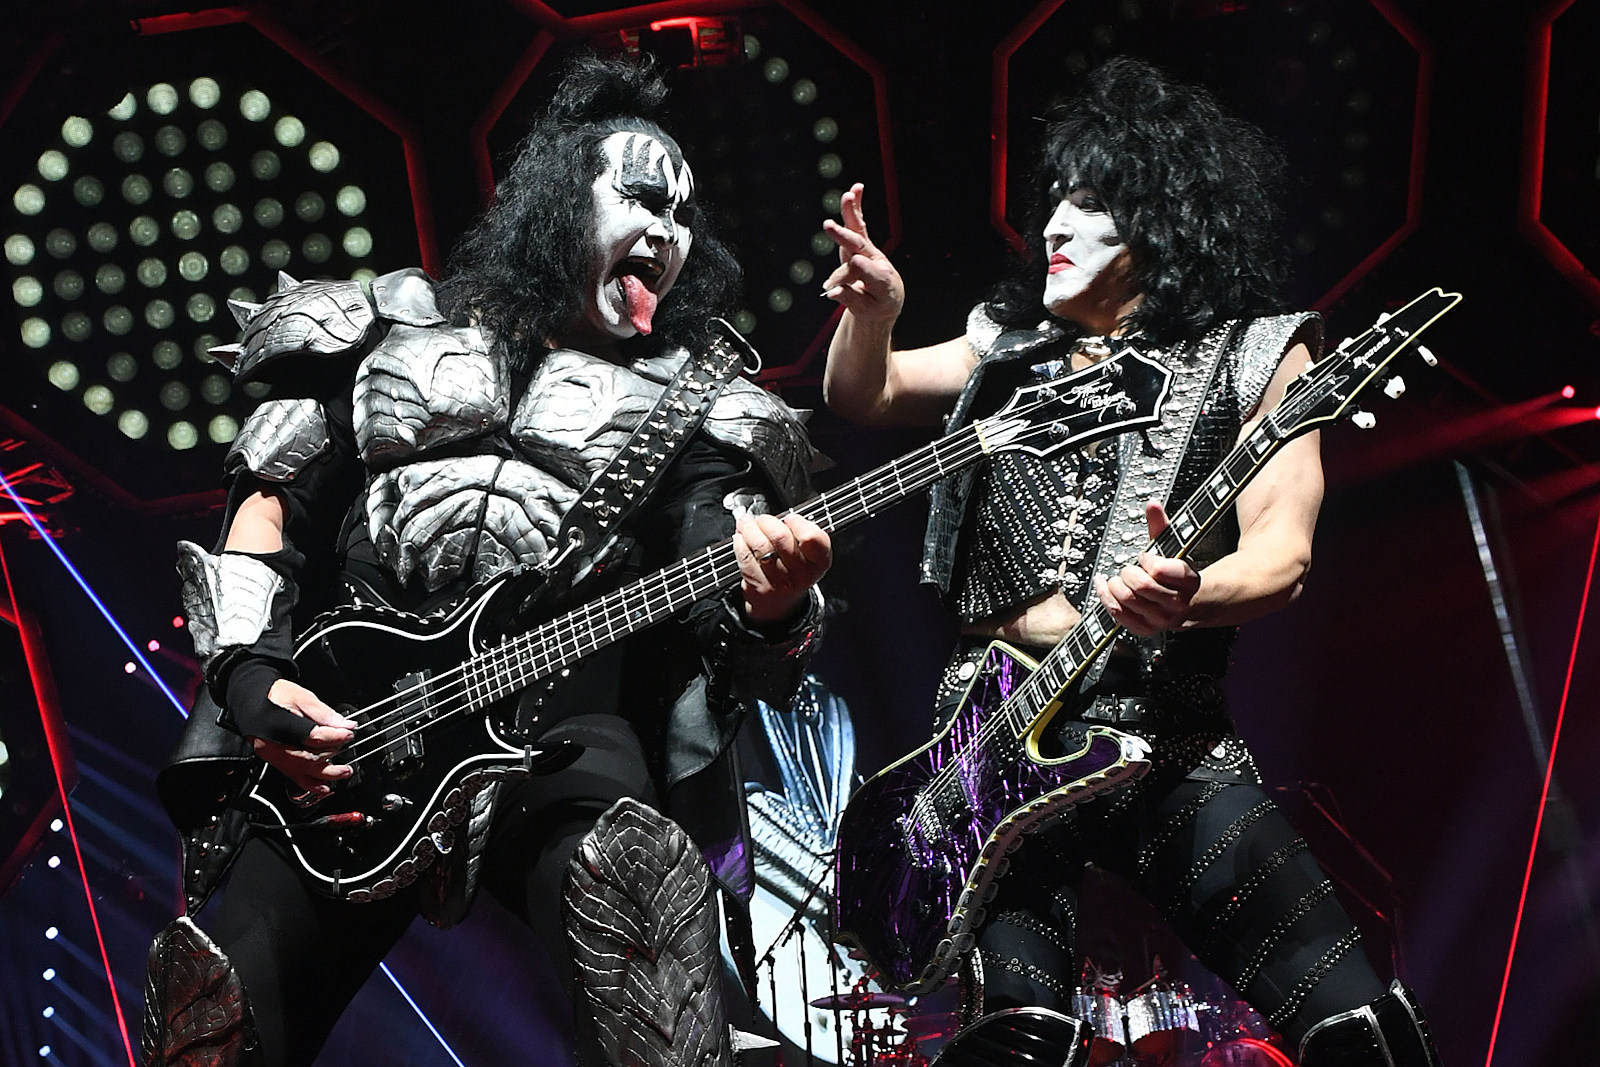 Kiss Return to Performing Following COVID Postponements